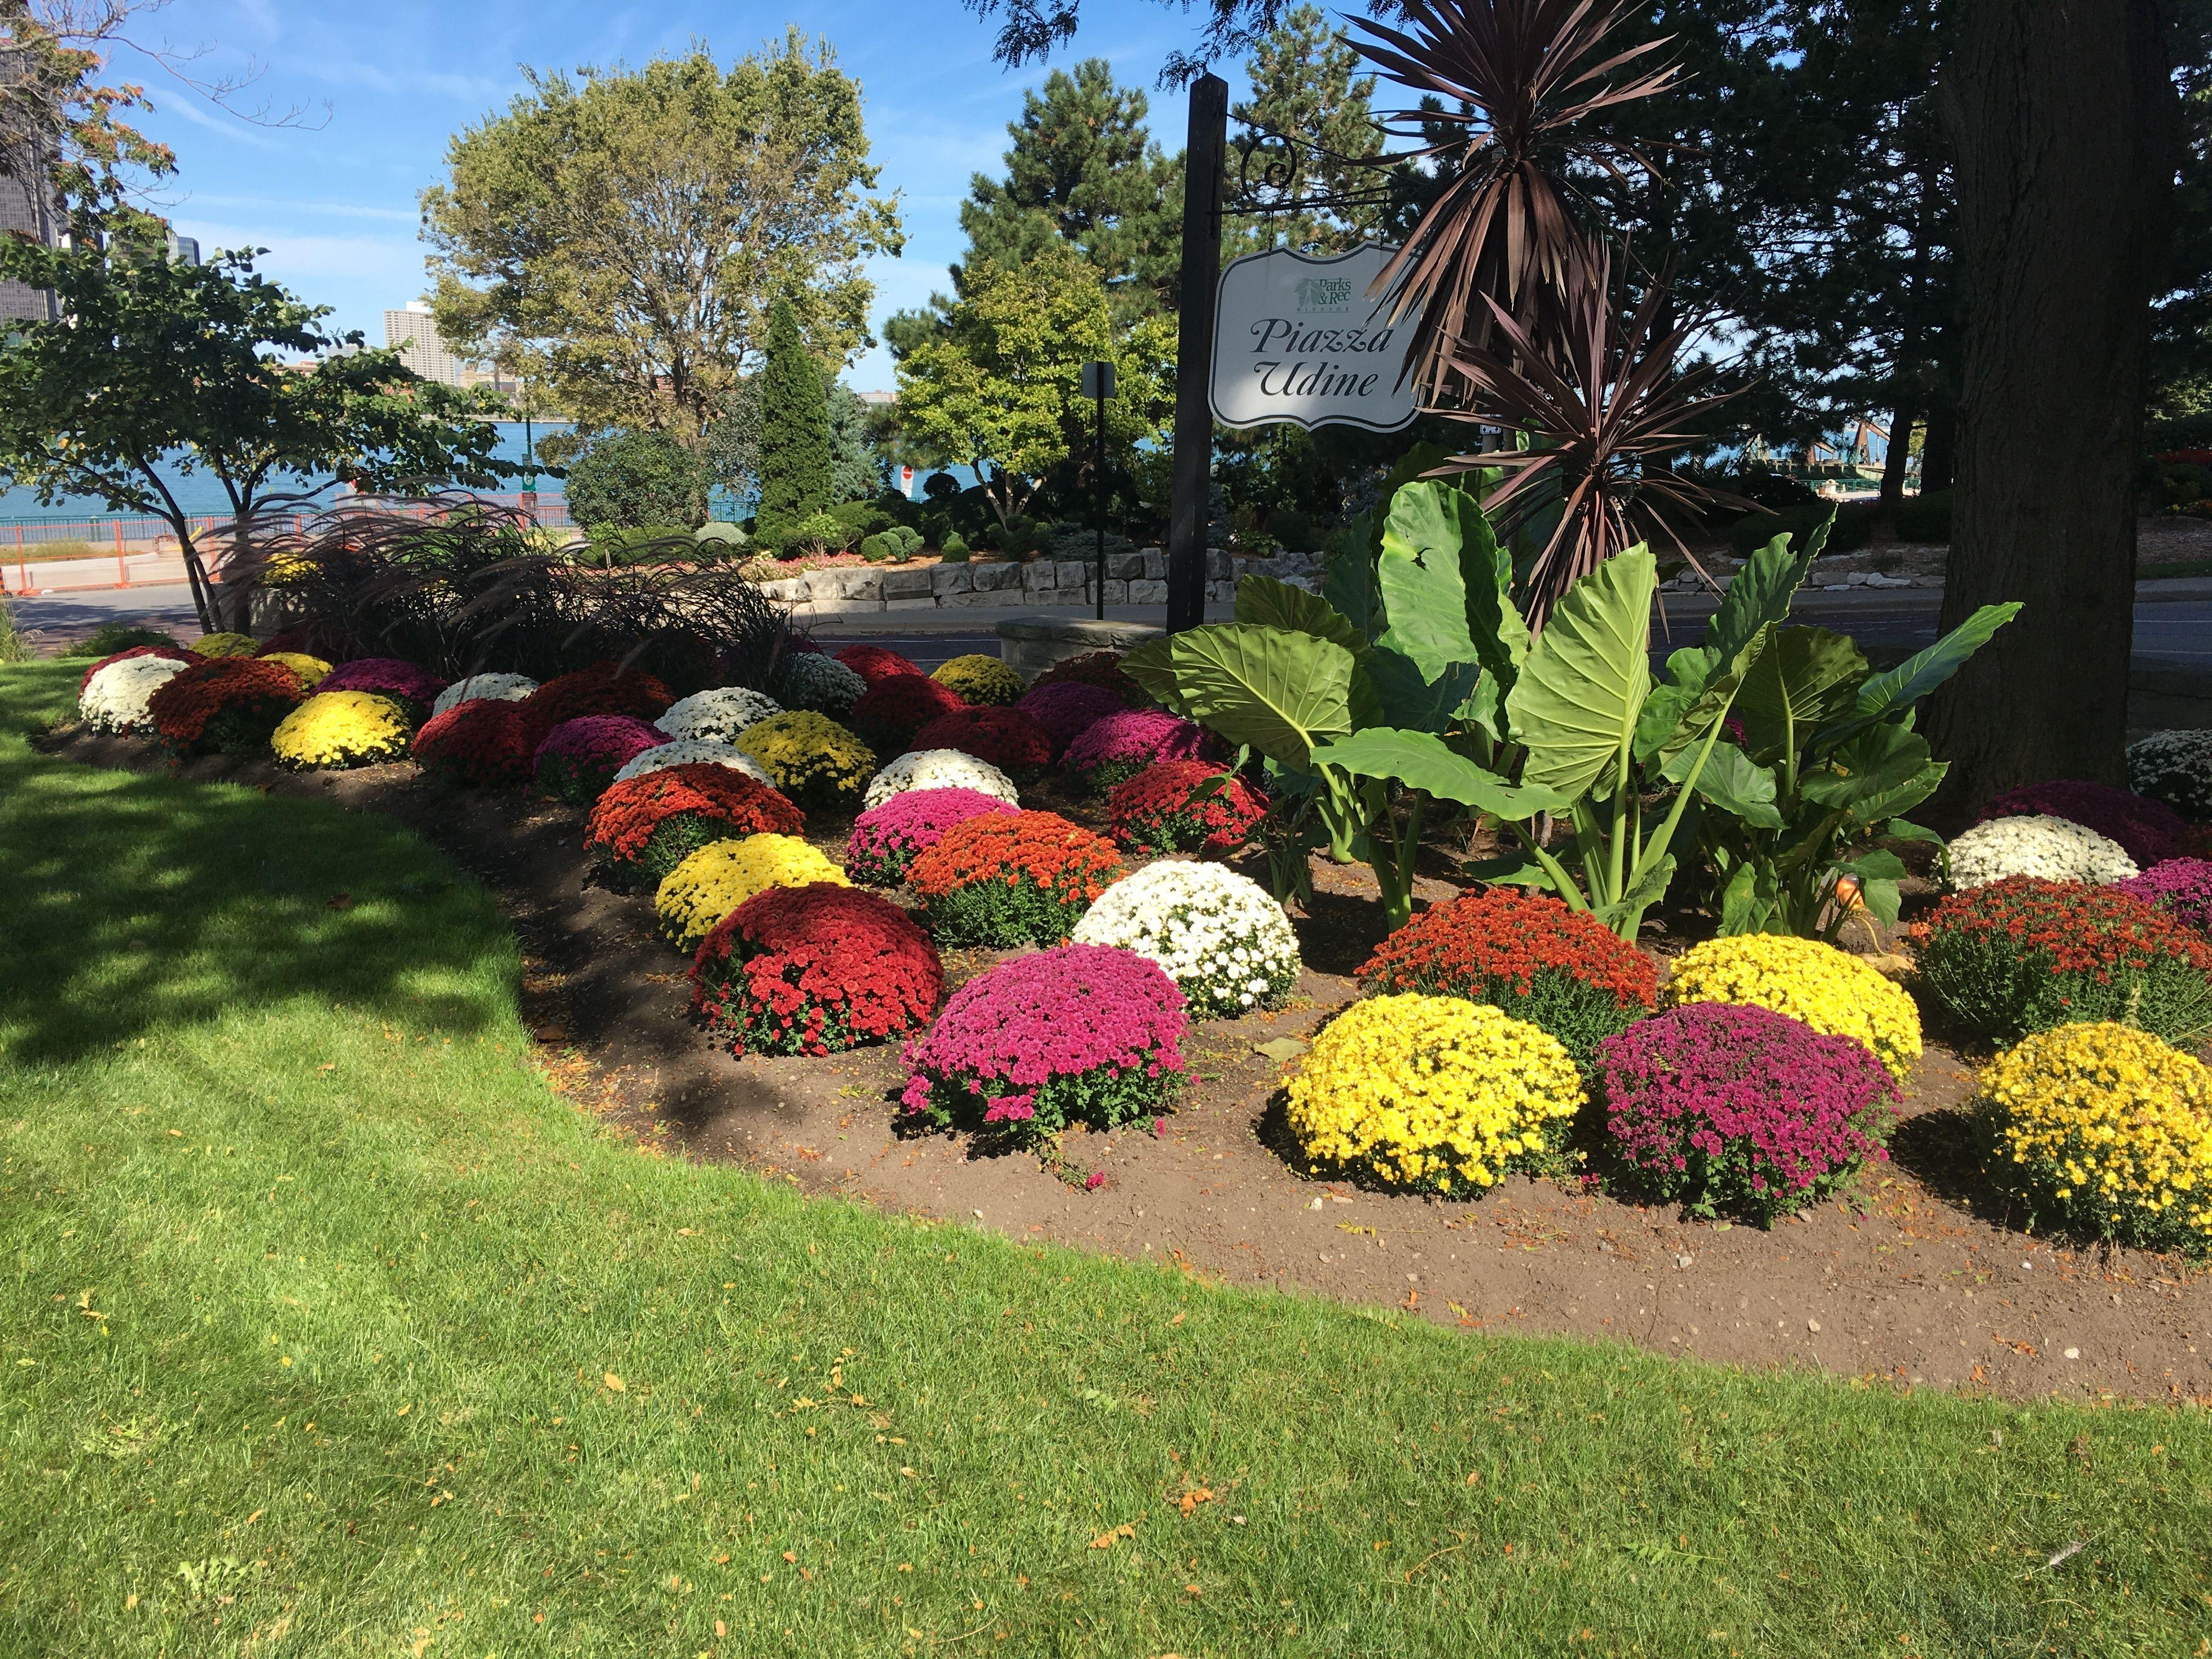 Stunning Mum Garden In Windsor, Ontario Canada. #flowers #fall #gardening